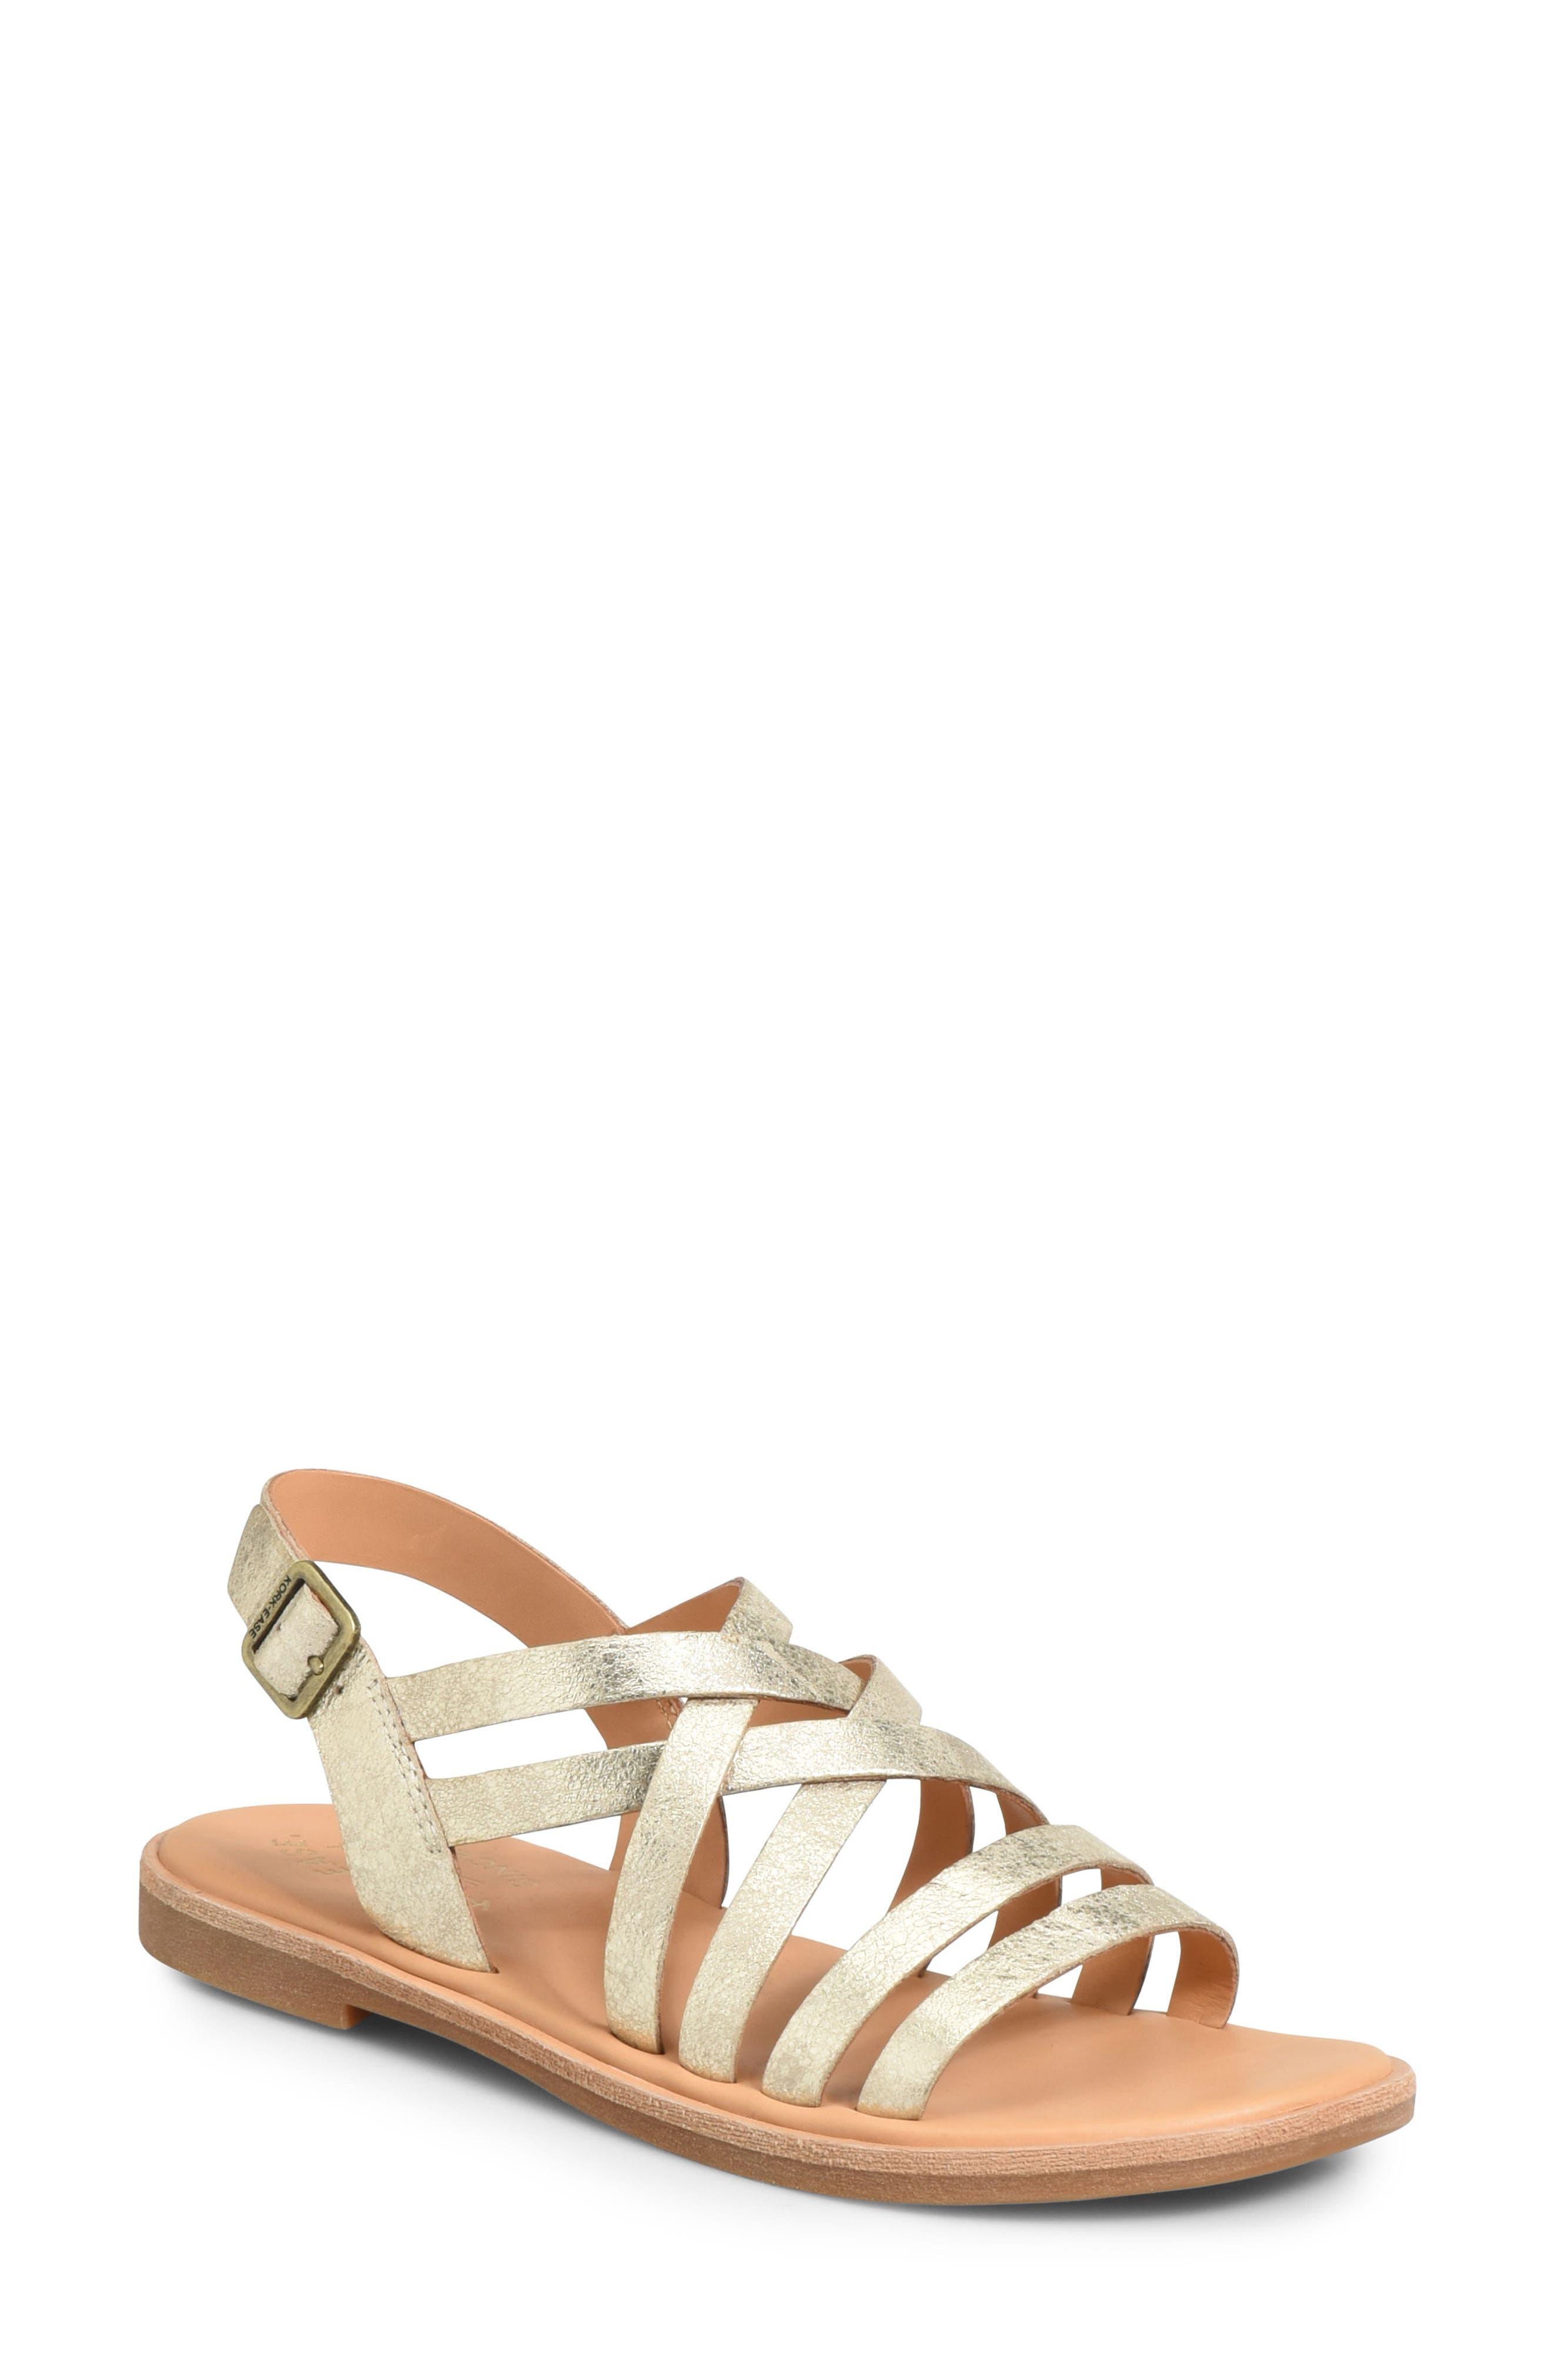 Nicobar Sandal,                             Main thumbnail 1, color,                             Gold Metallic Leather